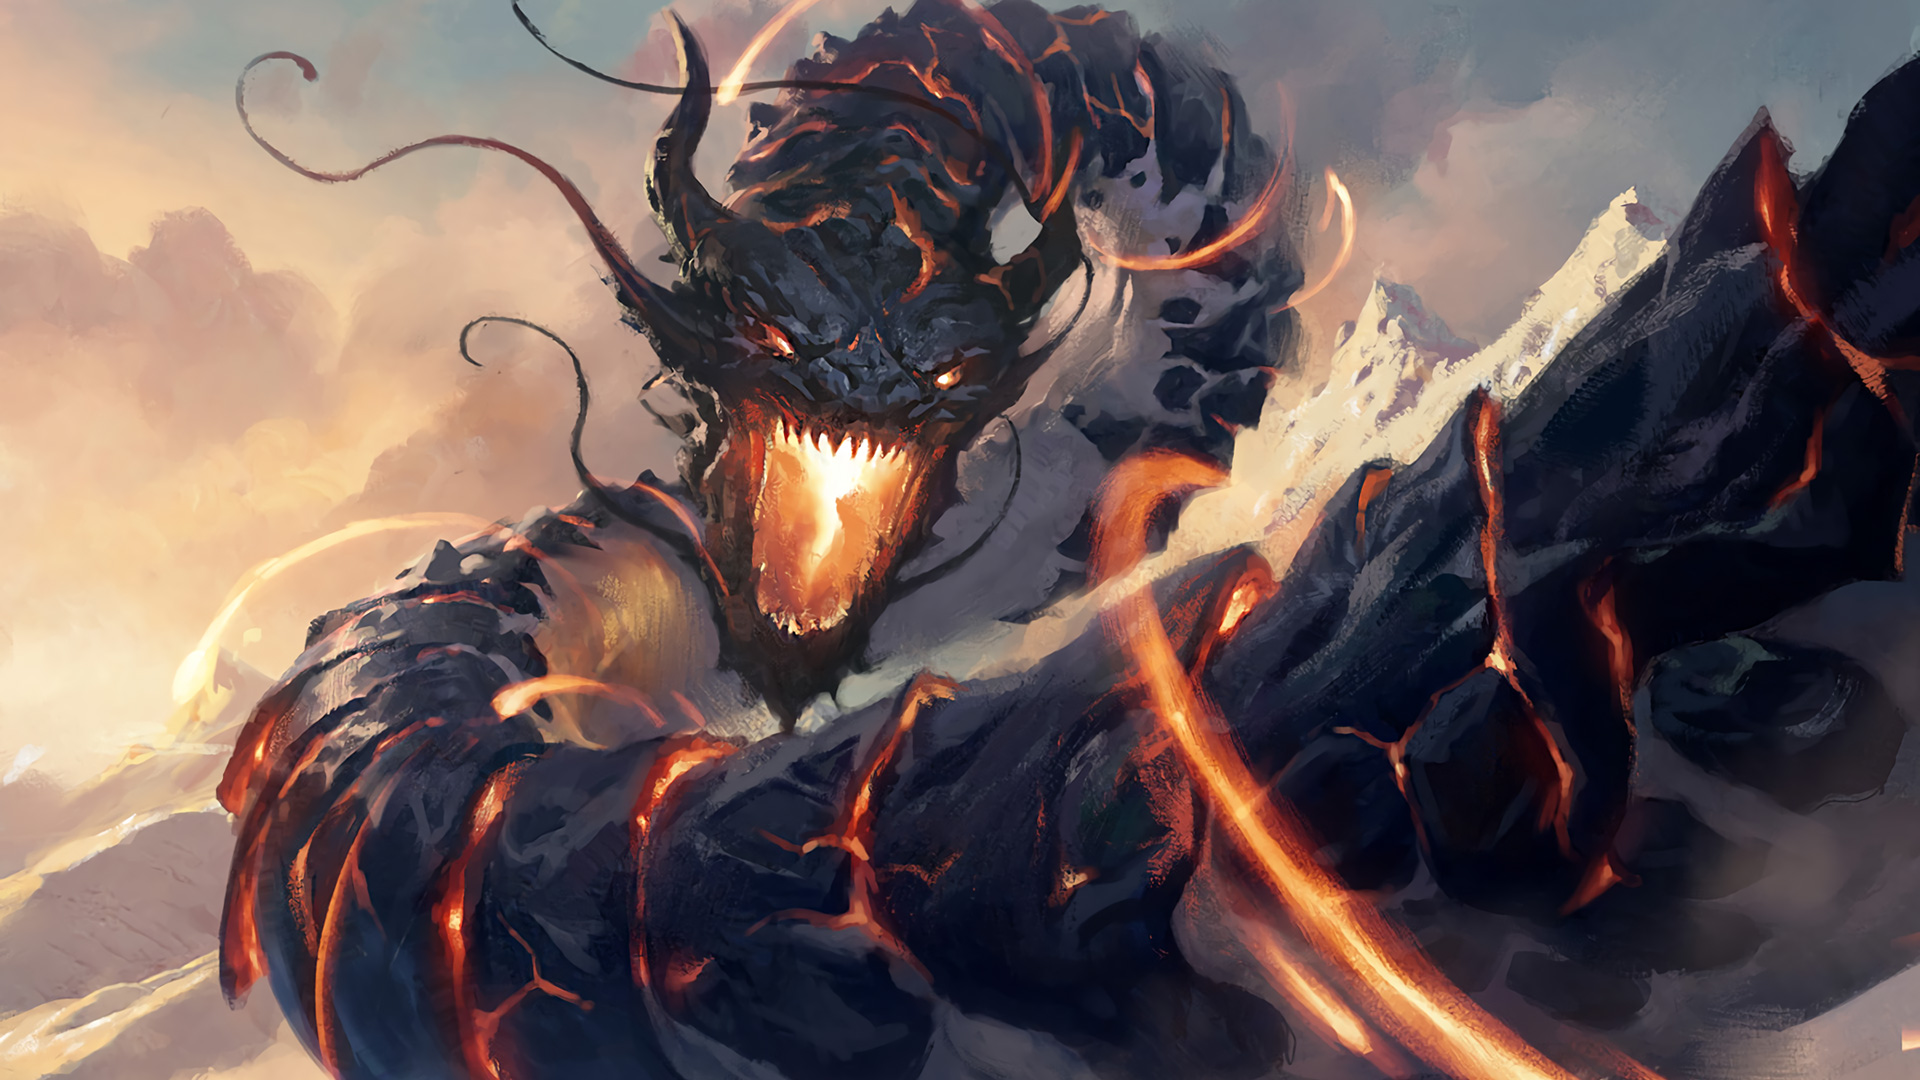 Dragon Fantasy Art, Hd Artist, 4k Wallpapers, Images, Backgrounds